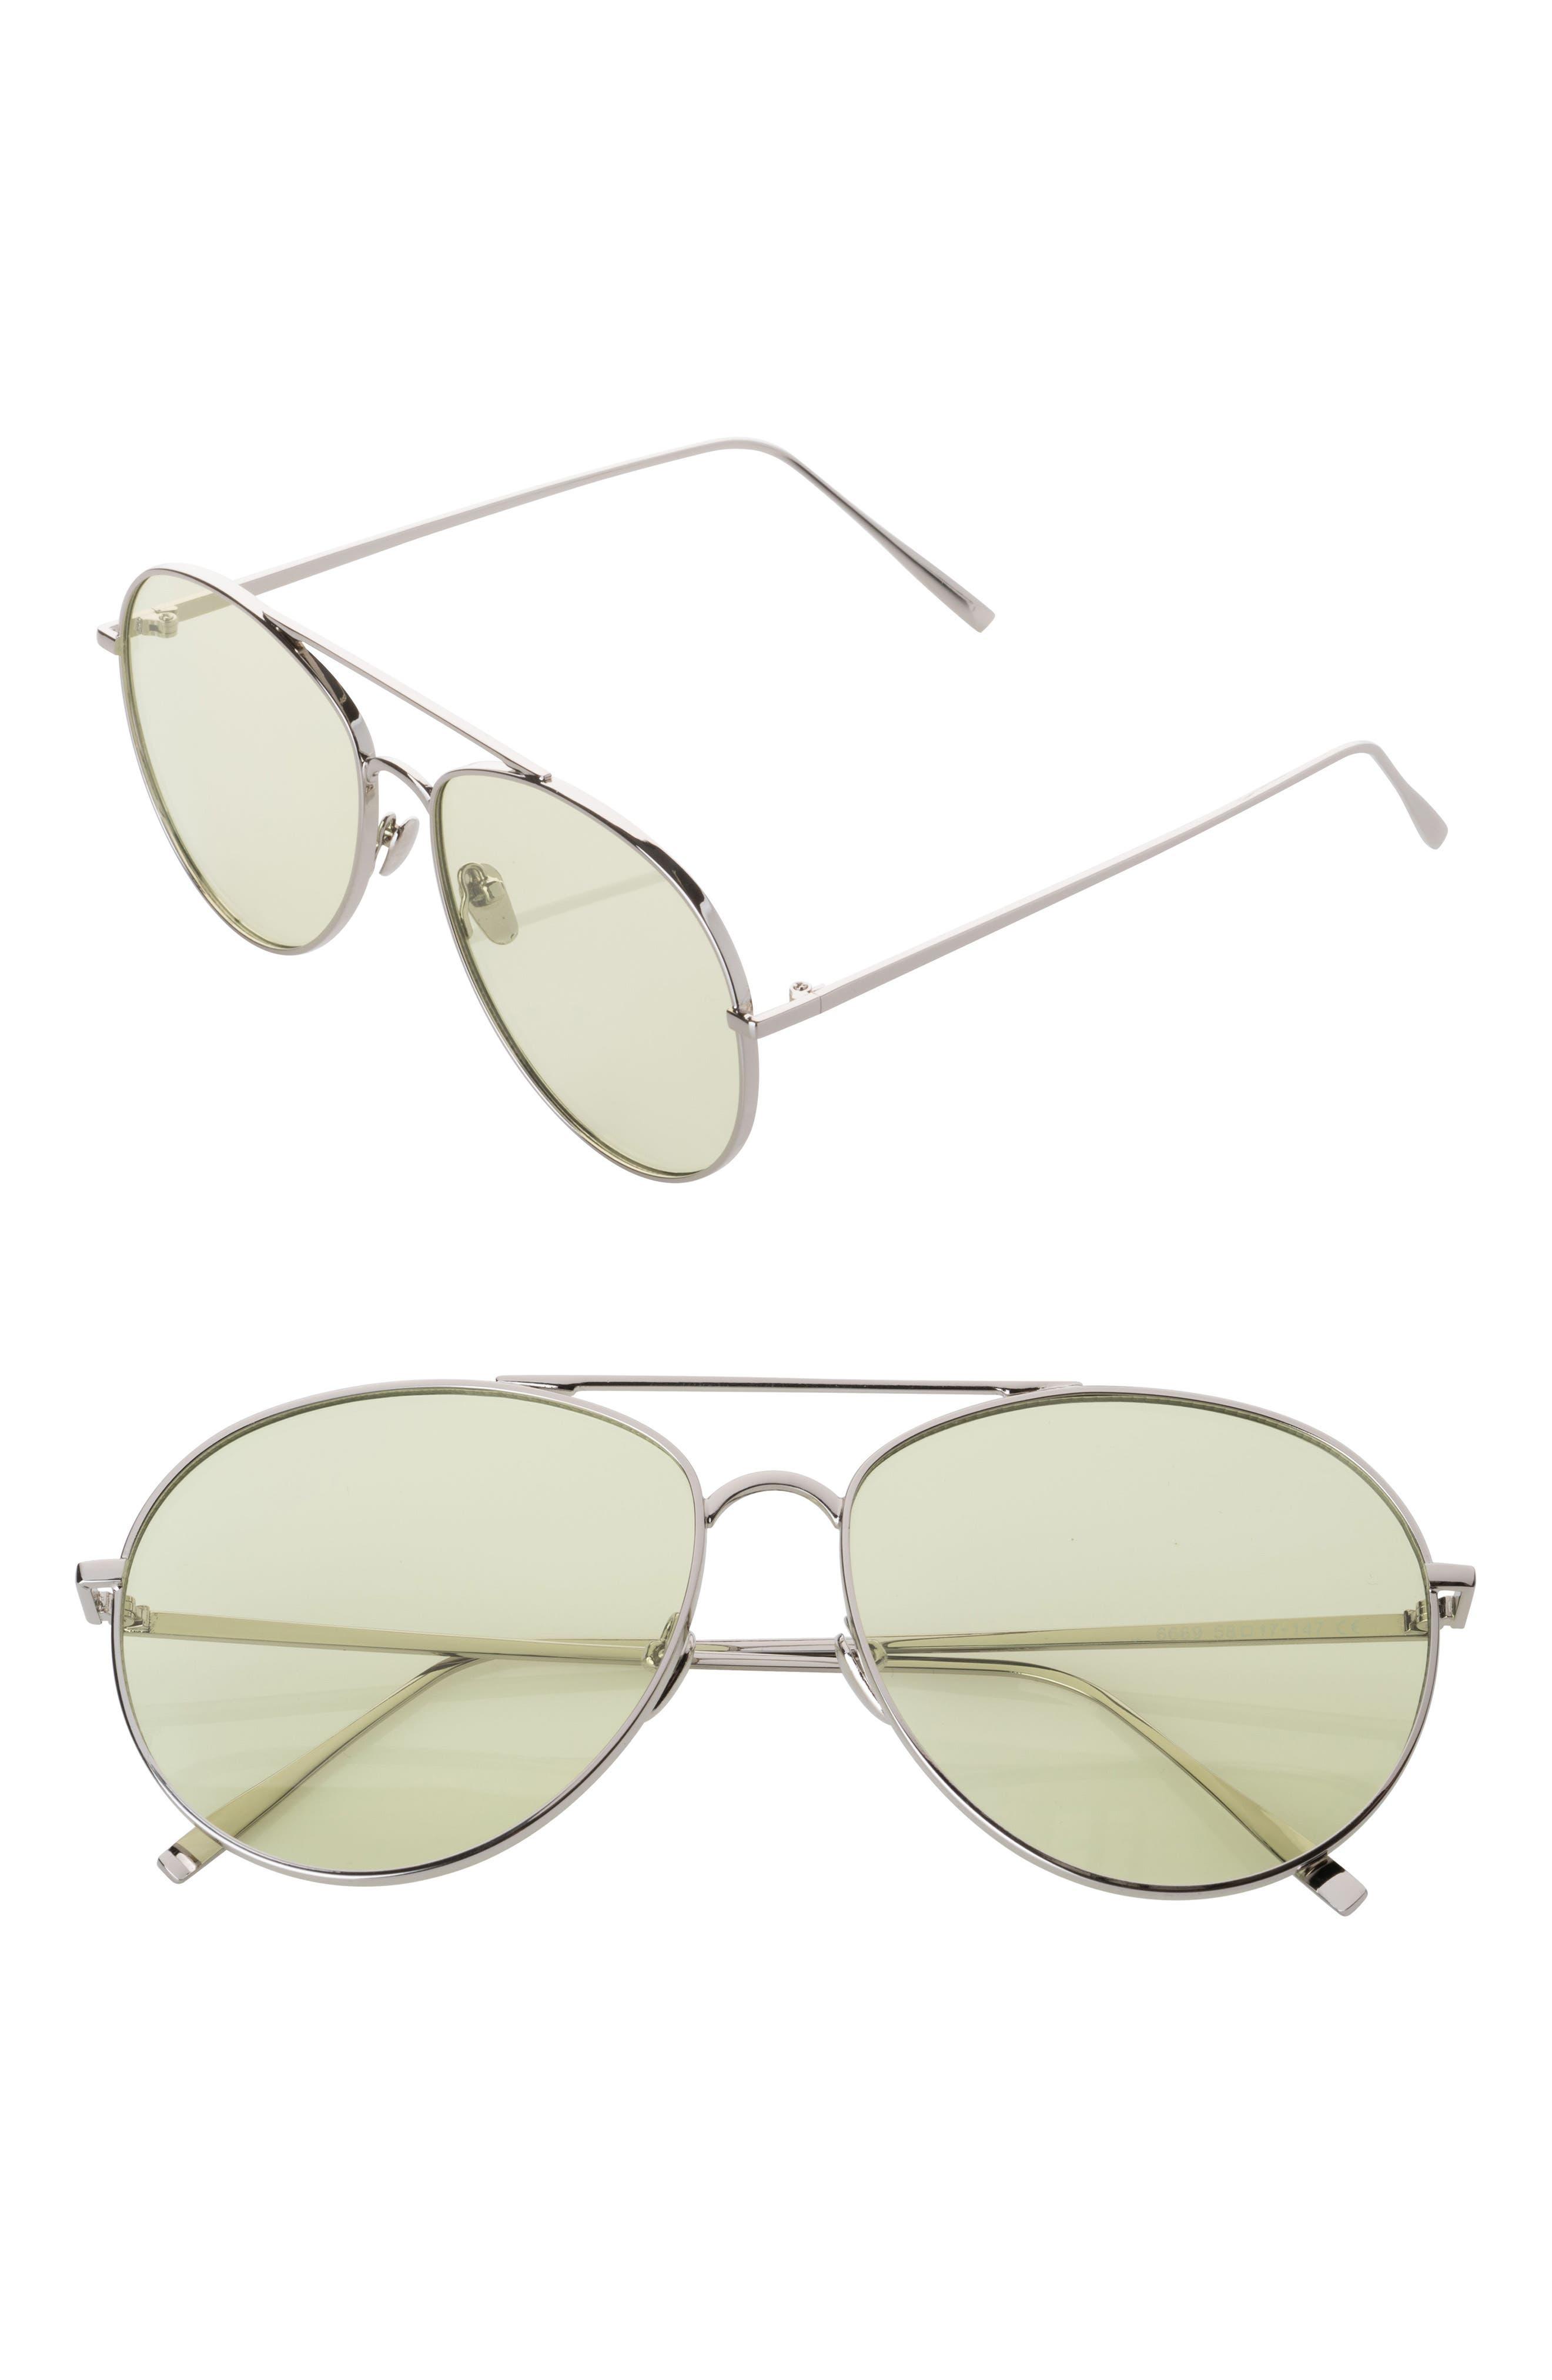 Aviator Sunglasses,                         Main,                         color, Yellow/ Silver